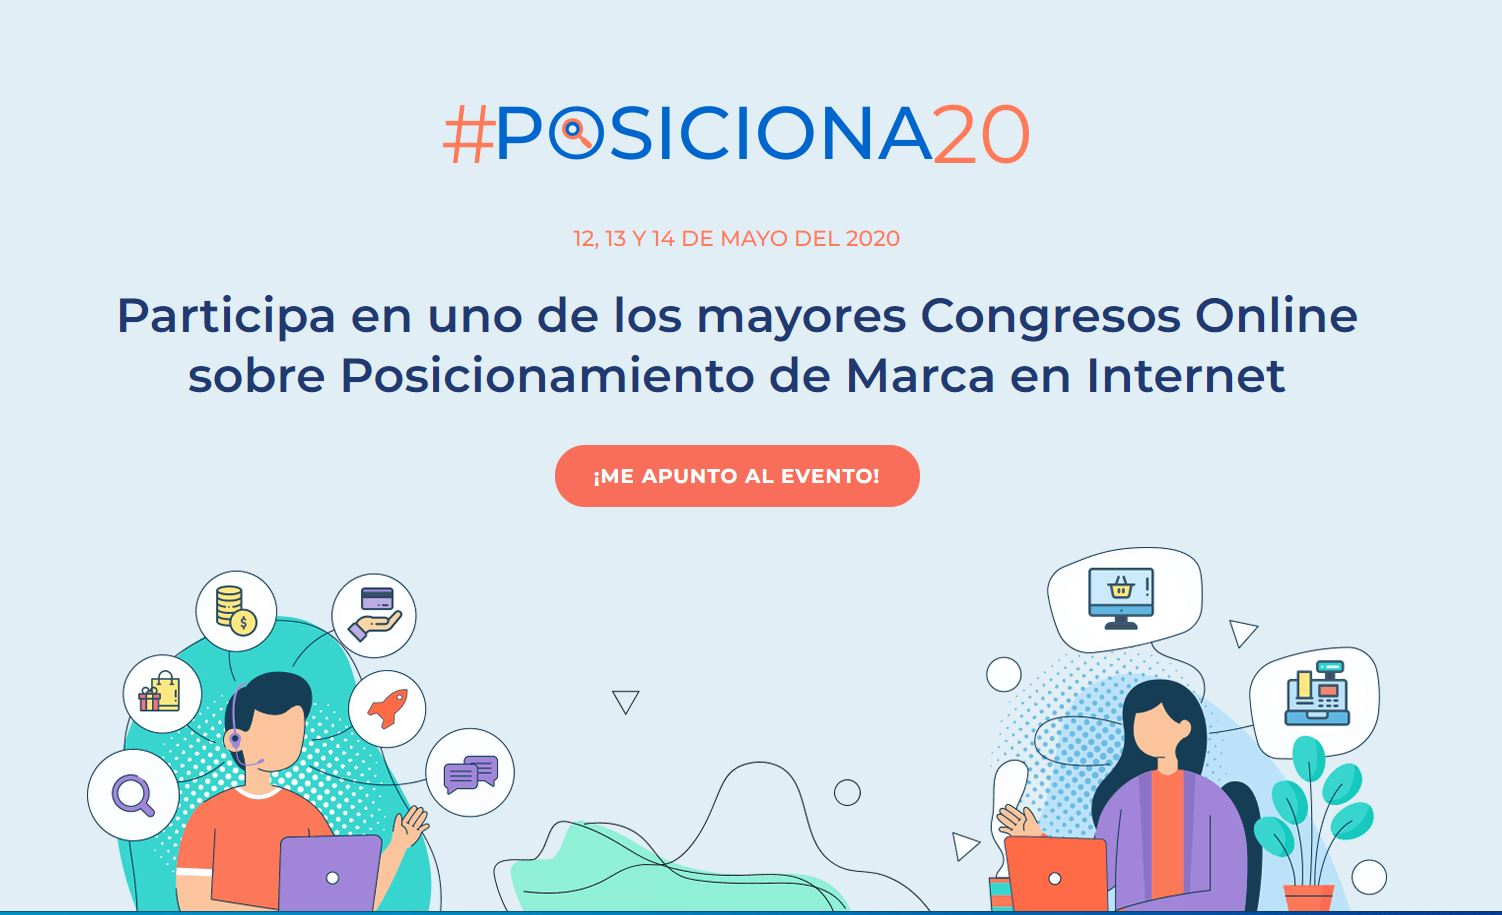 #posiciona20